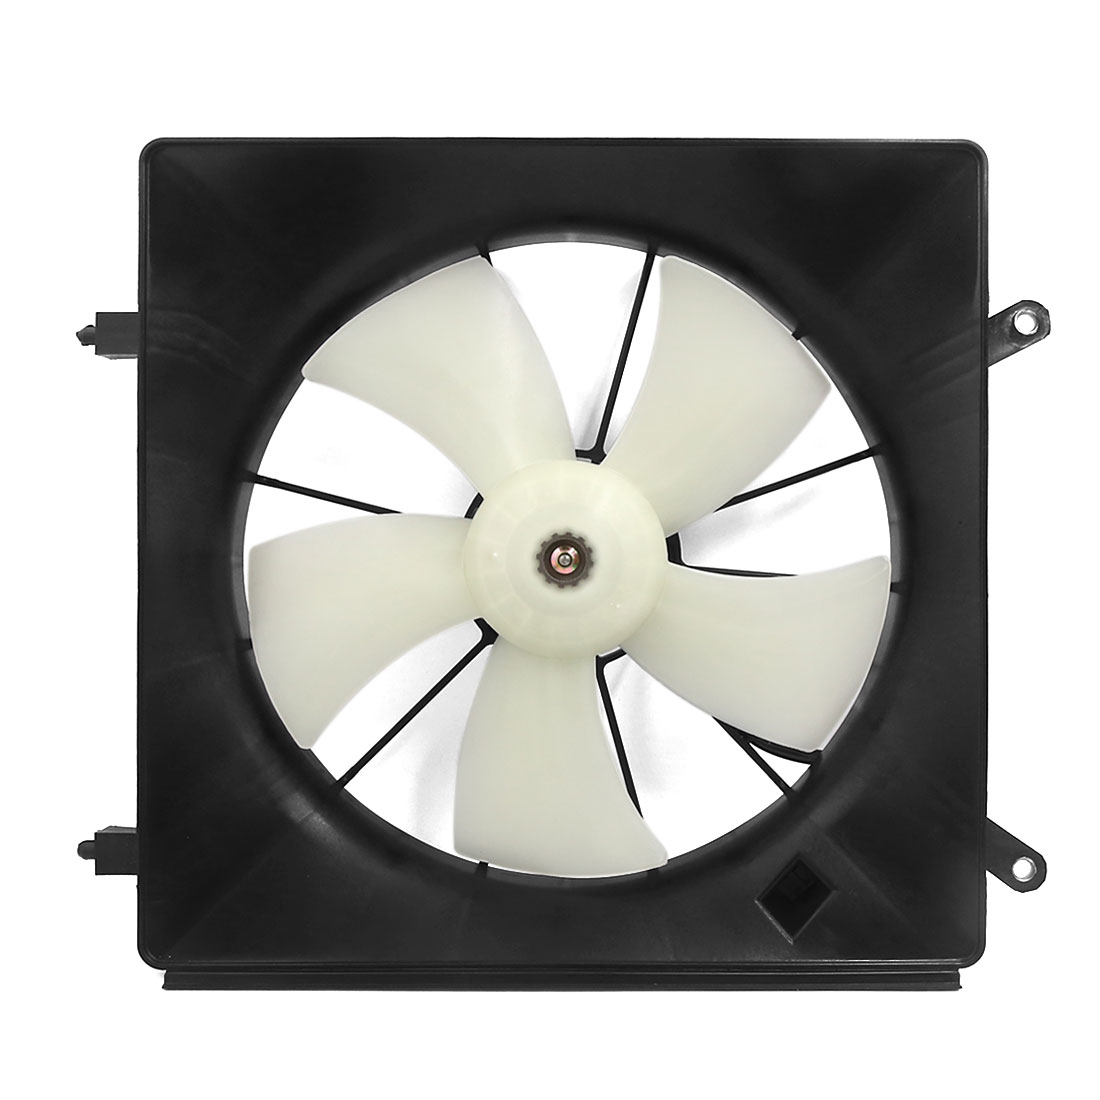 HO3115116 Radiator/Condenser Cooling Fan Assembly for Honda 03-11 Element 02-06 CR-V